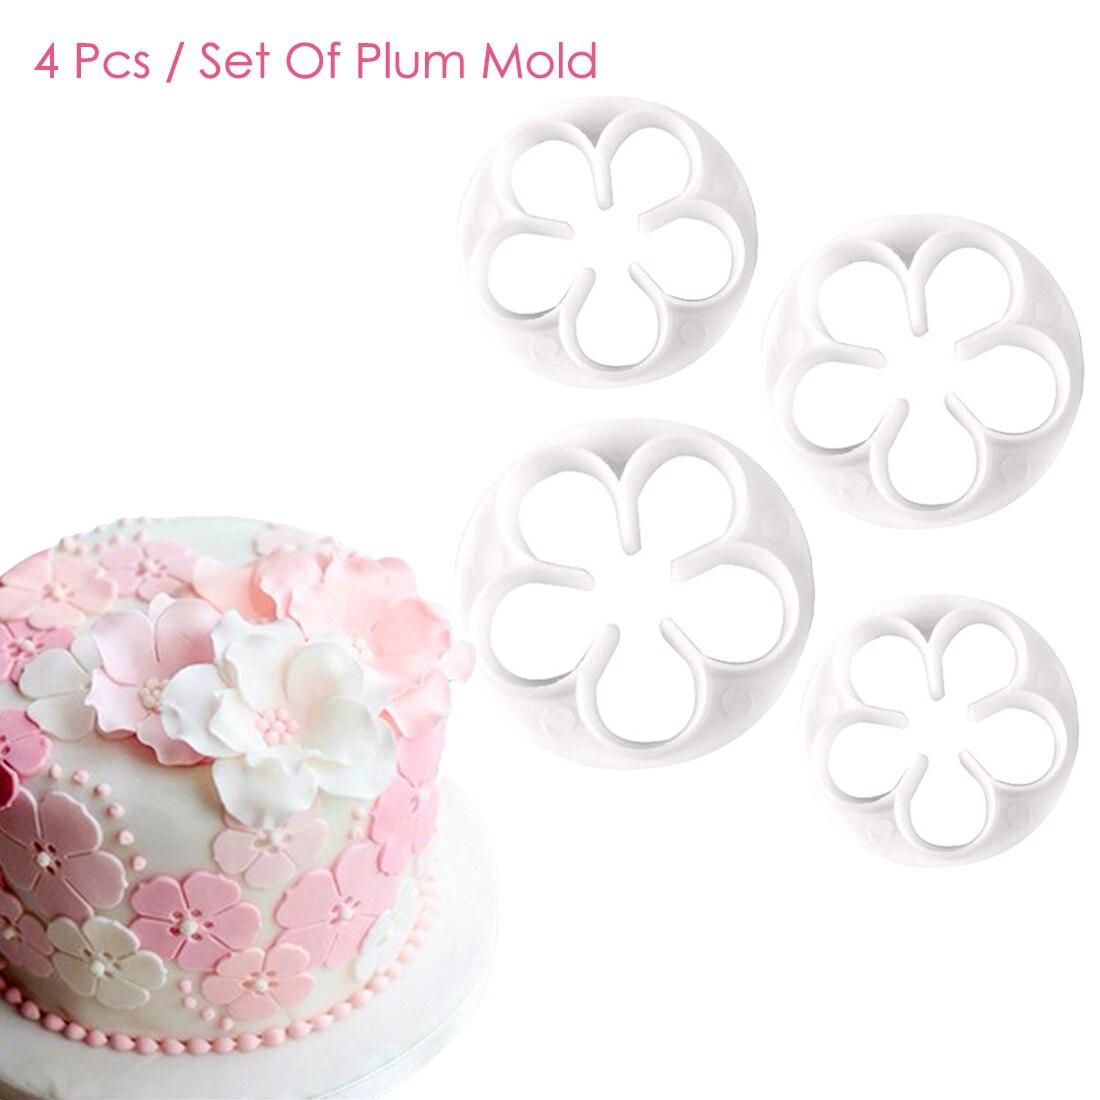 Genuine CULPITT PLUNGER CUTTERS /& EMBOSSER Sets Flower Xmas Sugarcraft Cake